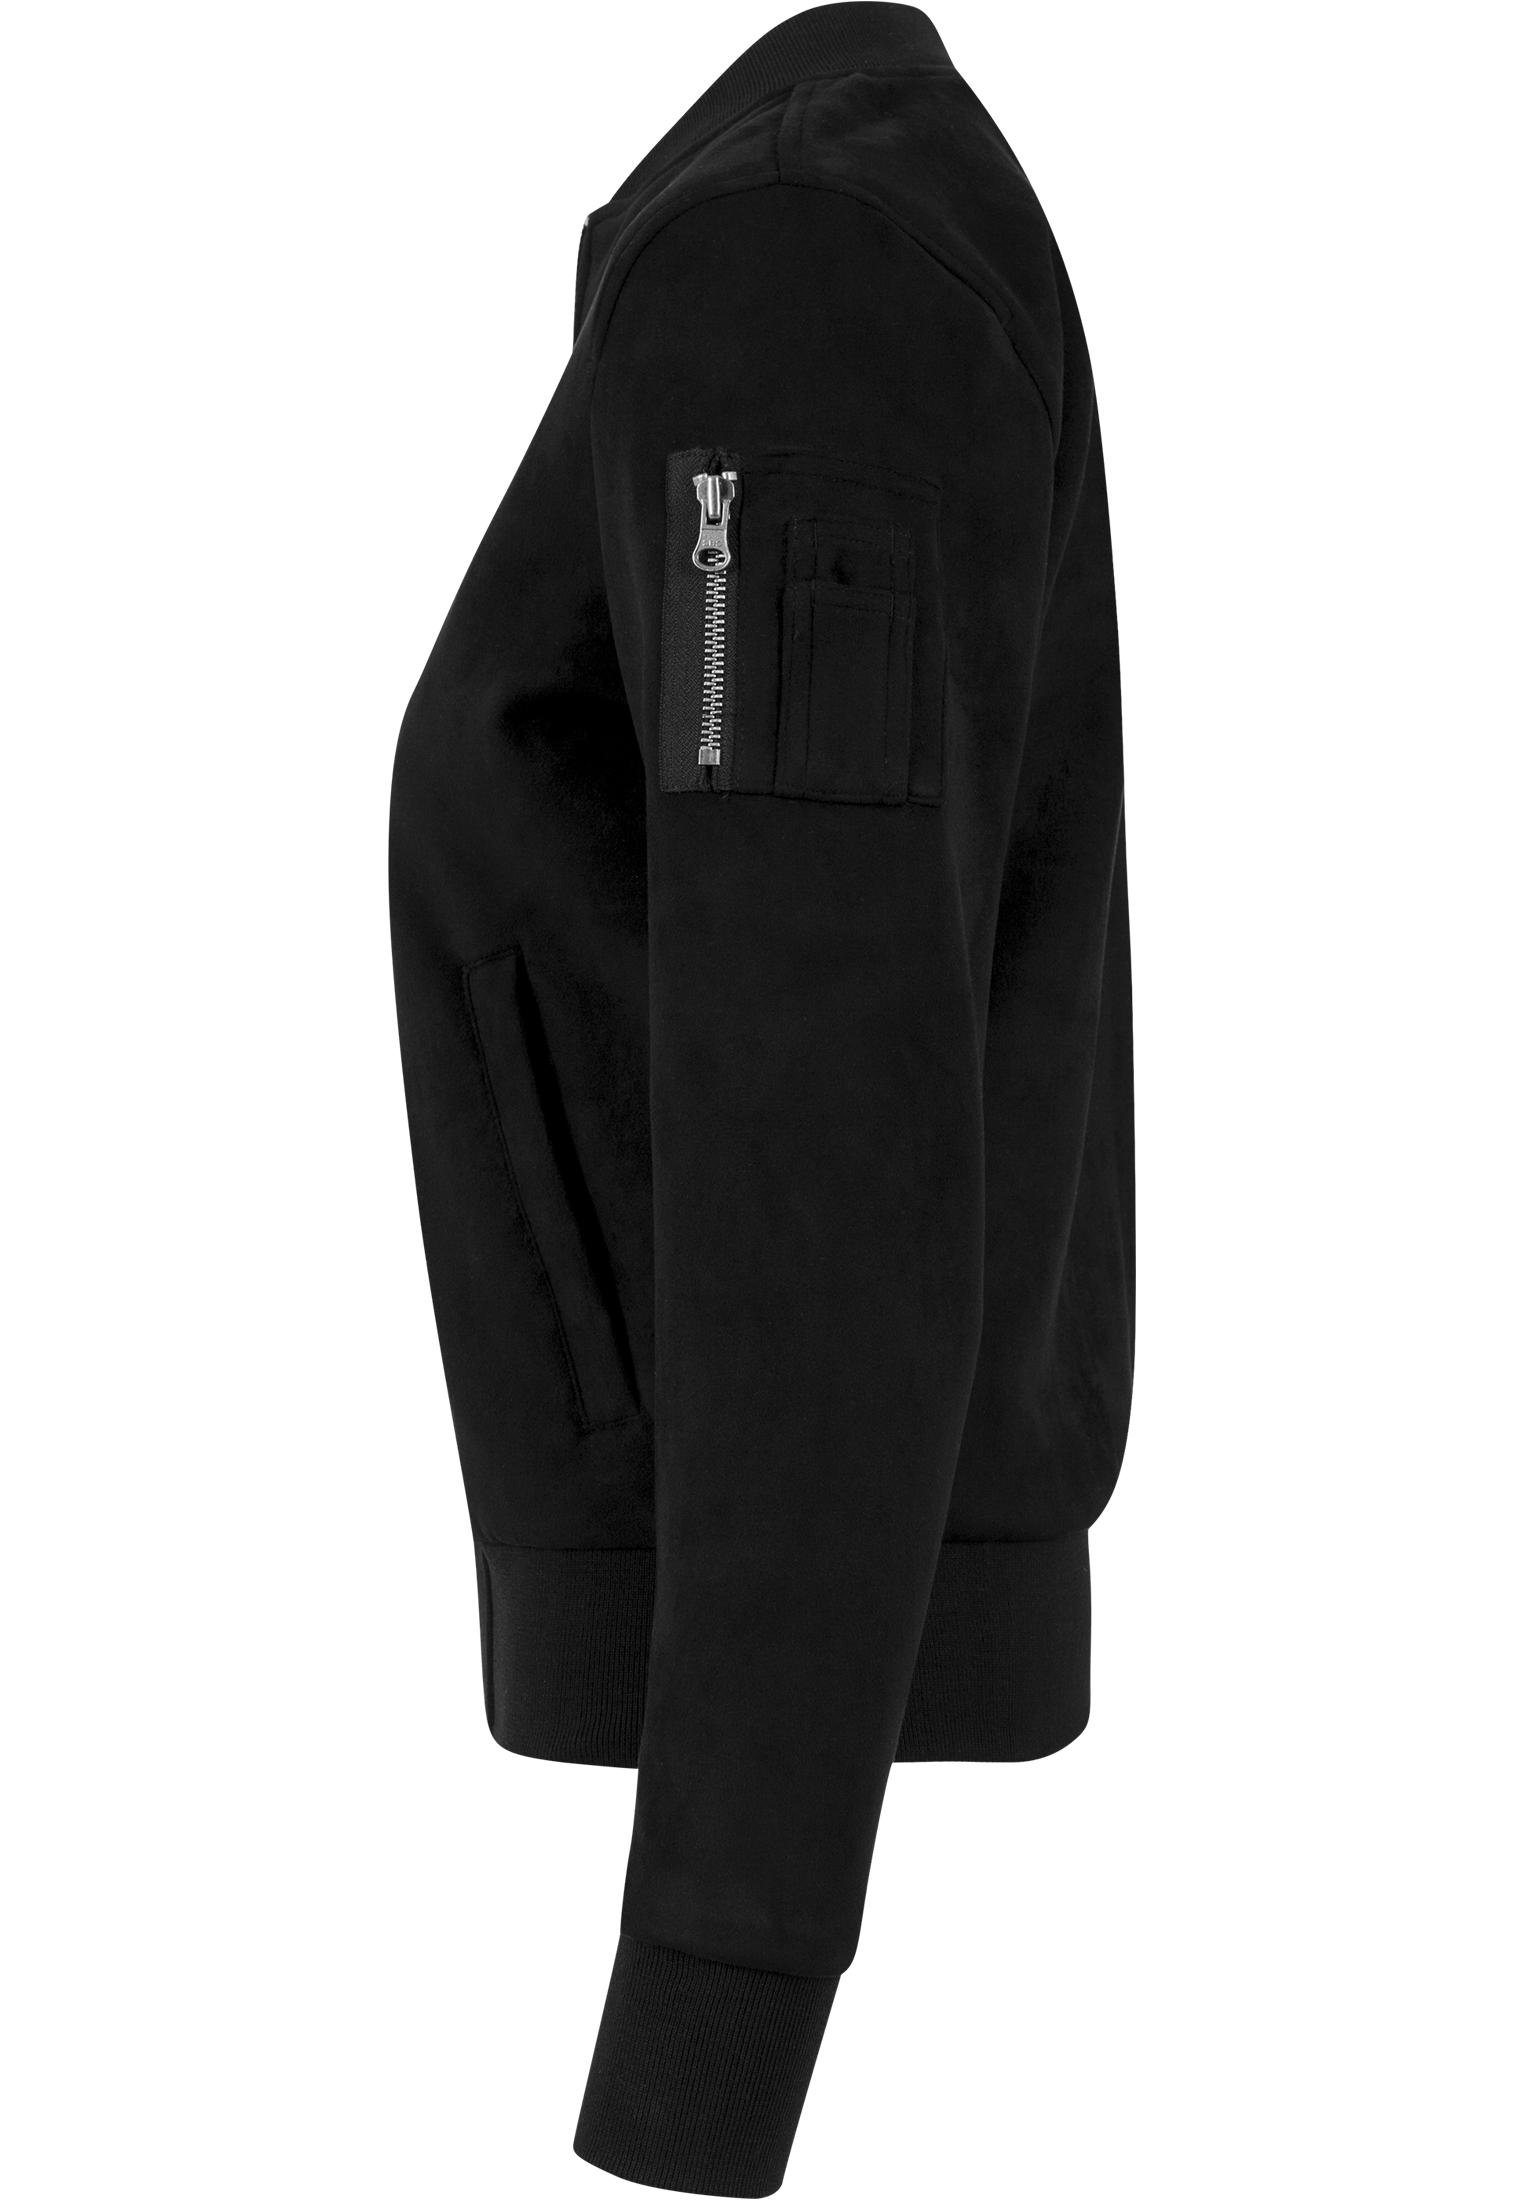 Urban Classics Veste Femmes Dames Imitation SUEDE Bomber Jacket